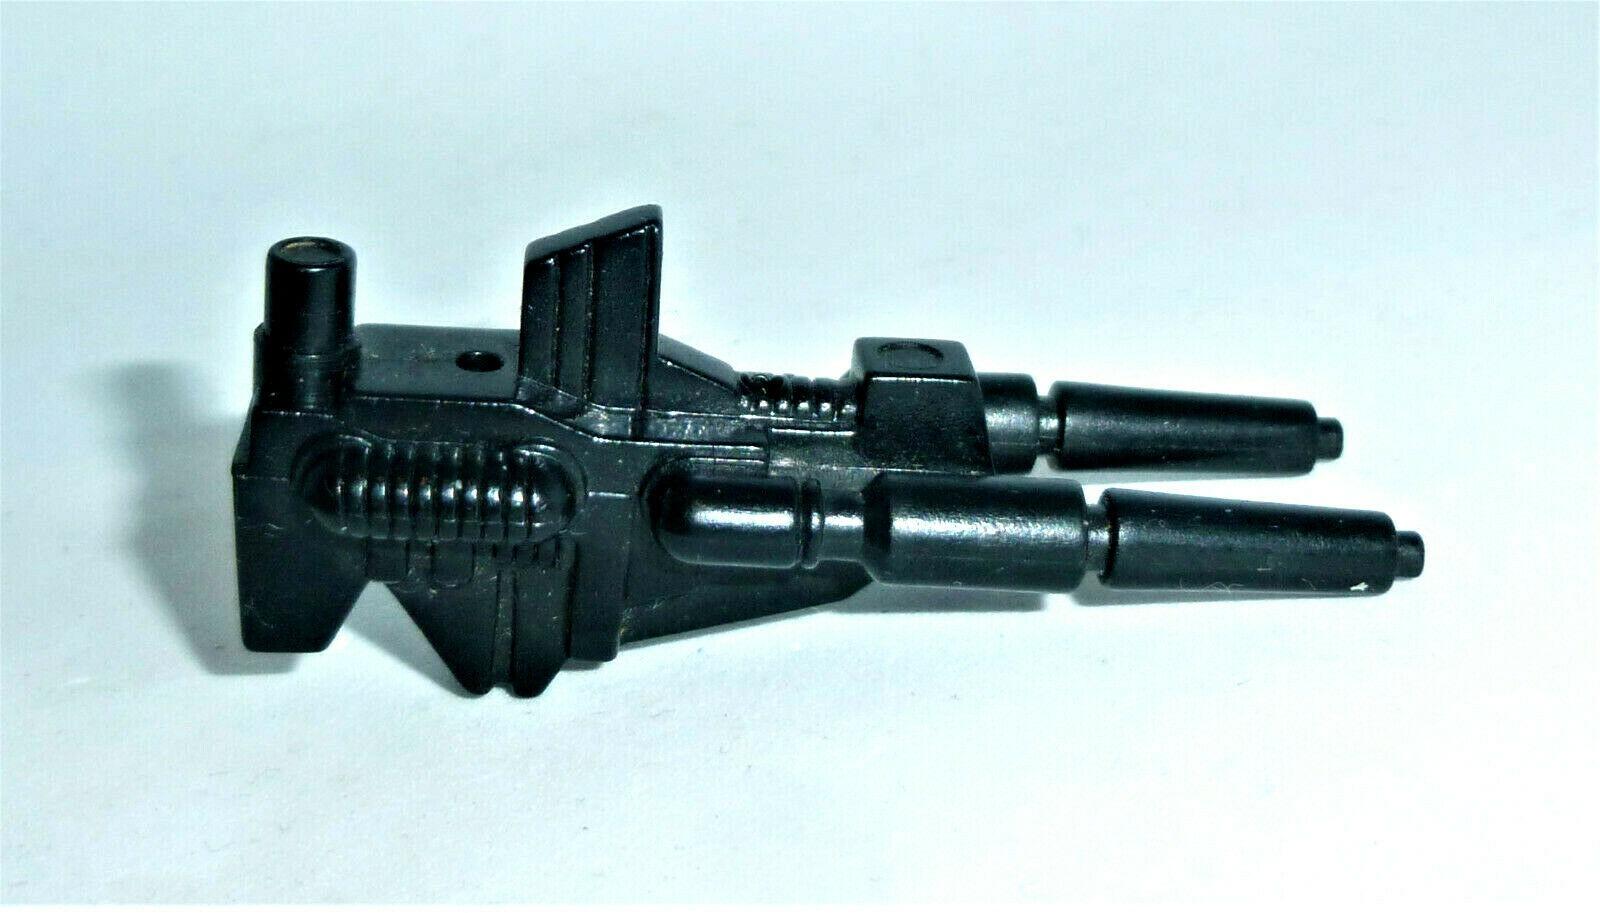 Grimlock Gun / Laser - Rifle G1 Transformers Vintage Hasbro 1985 Action Figure - 2